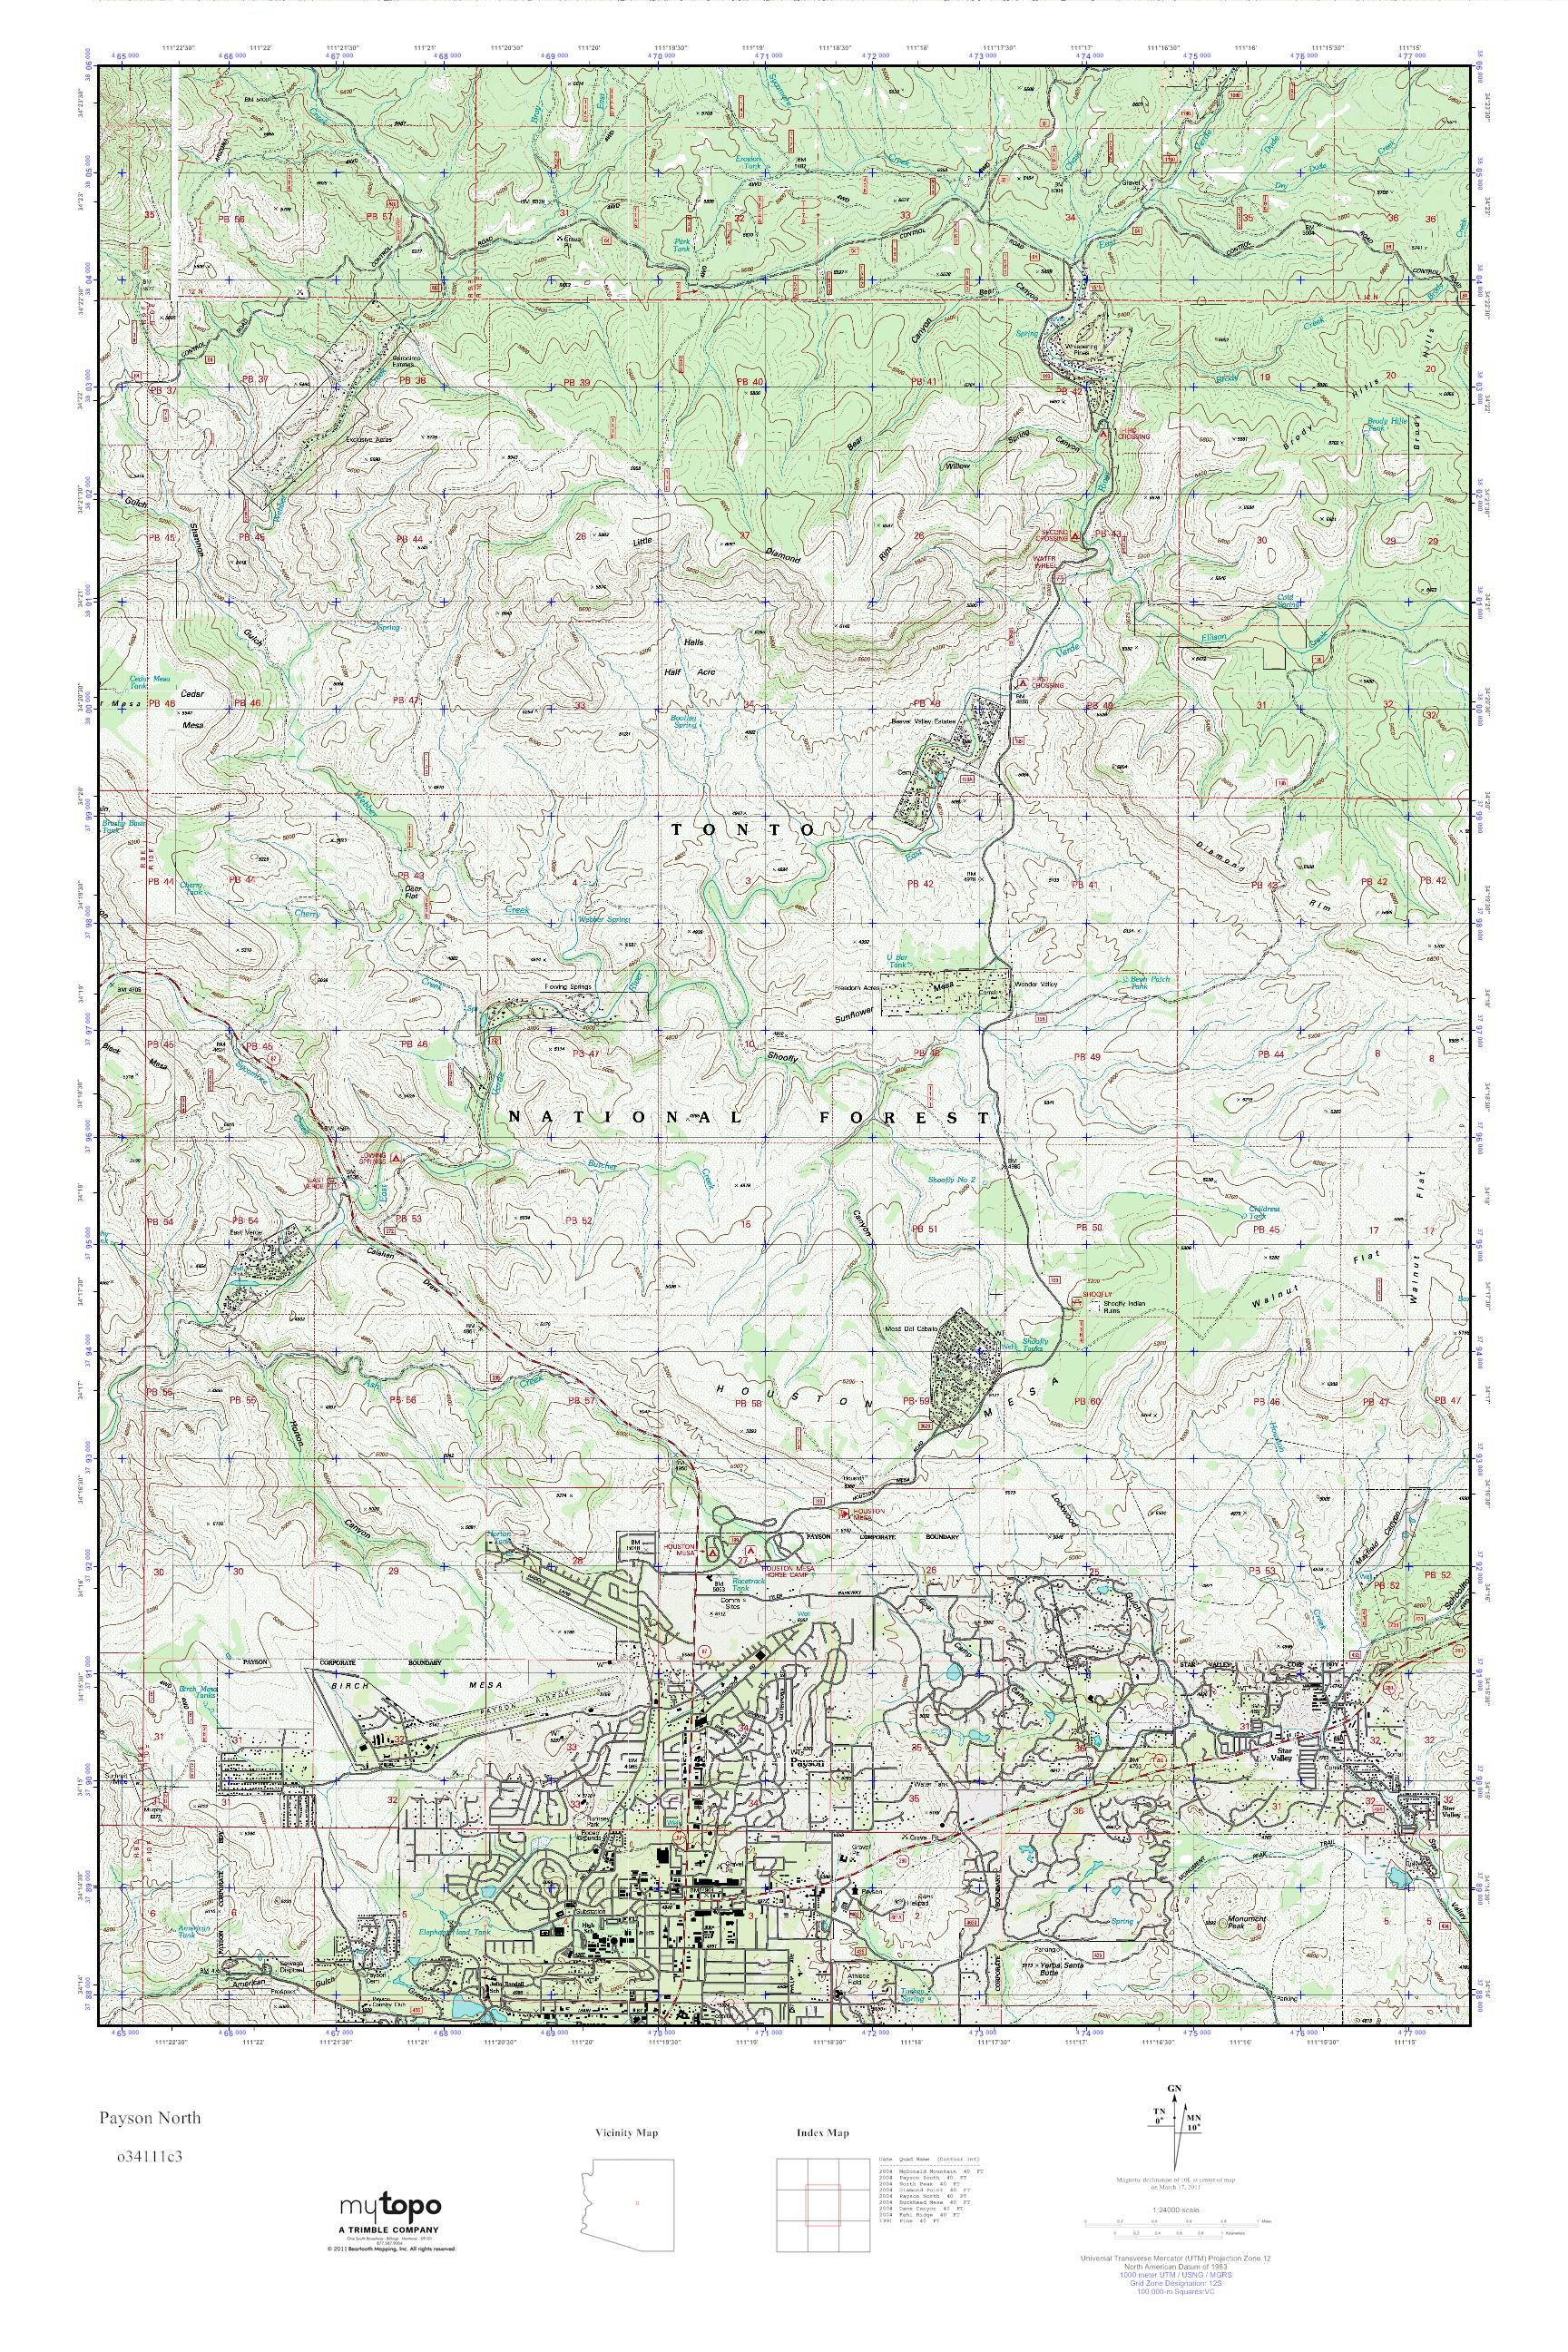 North Arizona Map.Mytopo Payson North Arizona Usgs Quad Topo Map